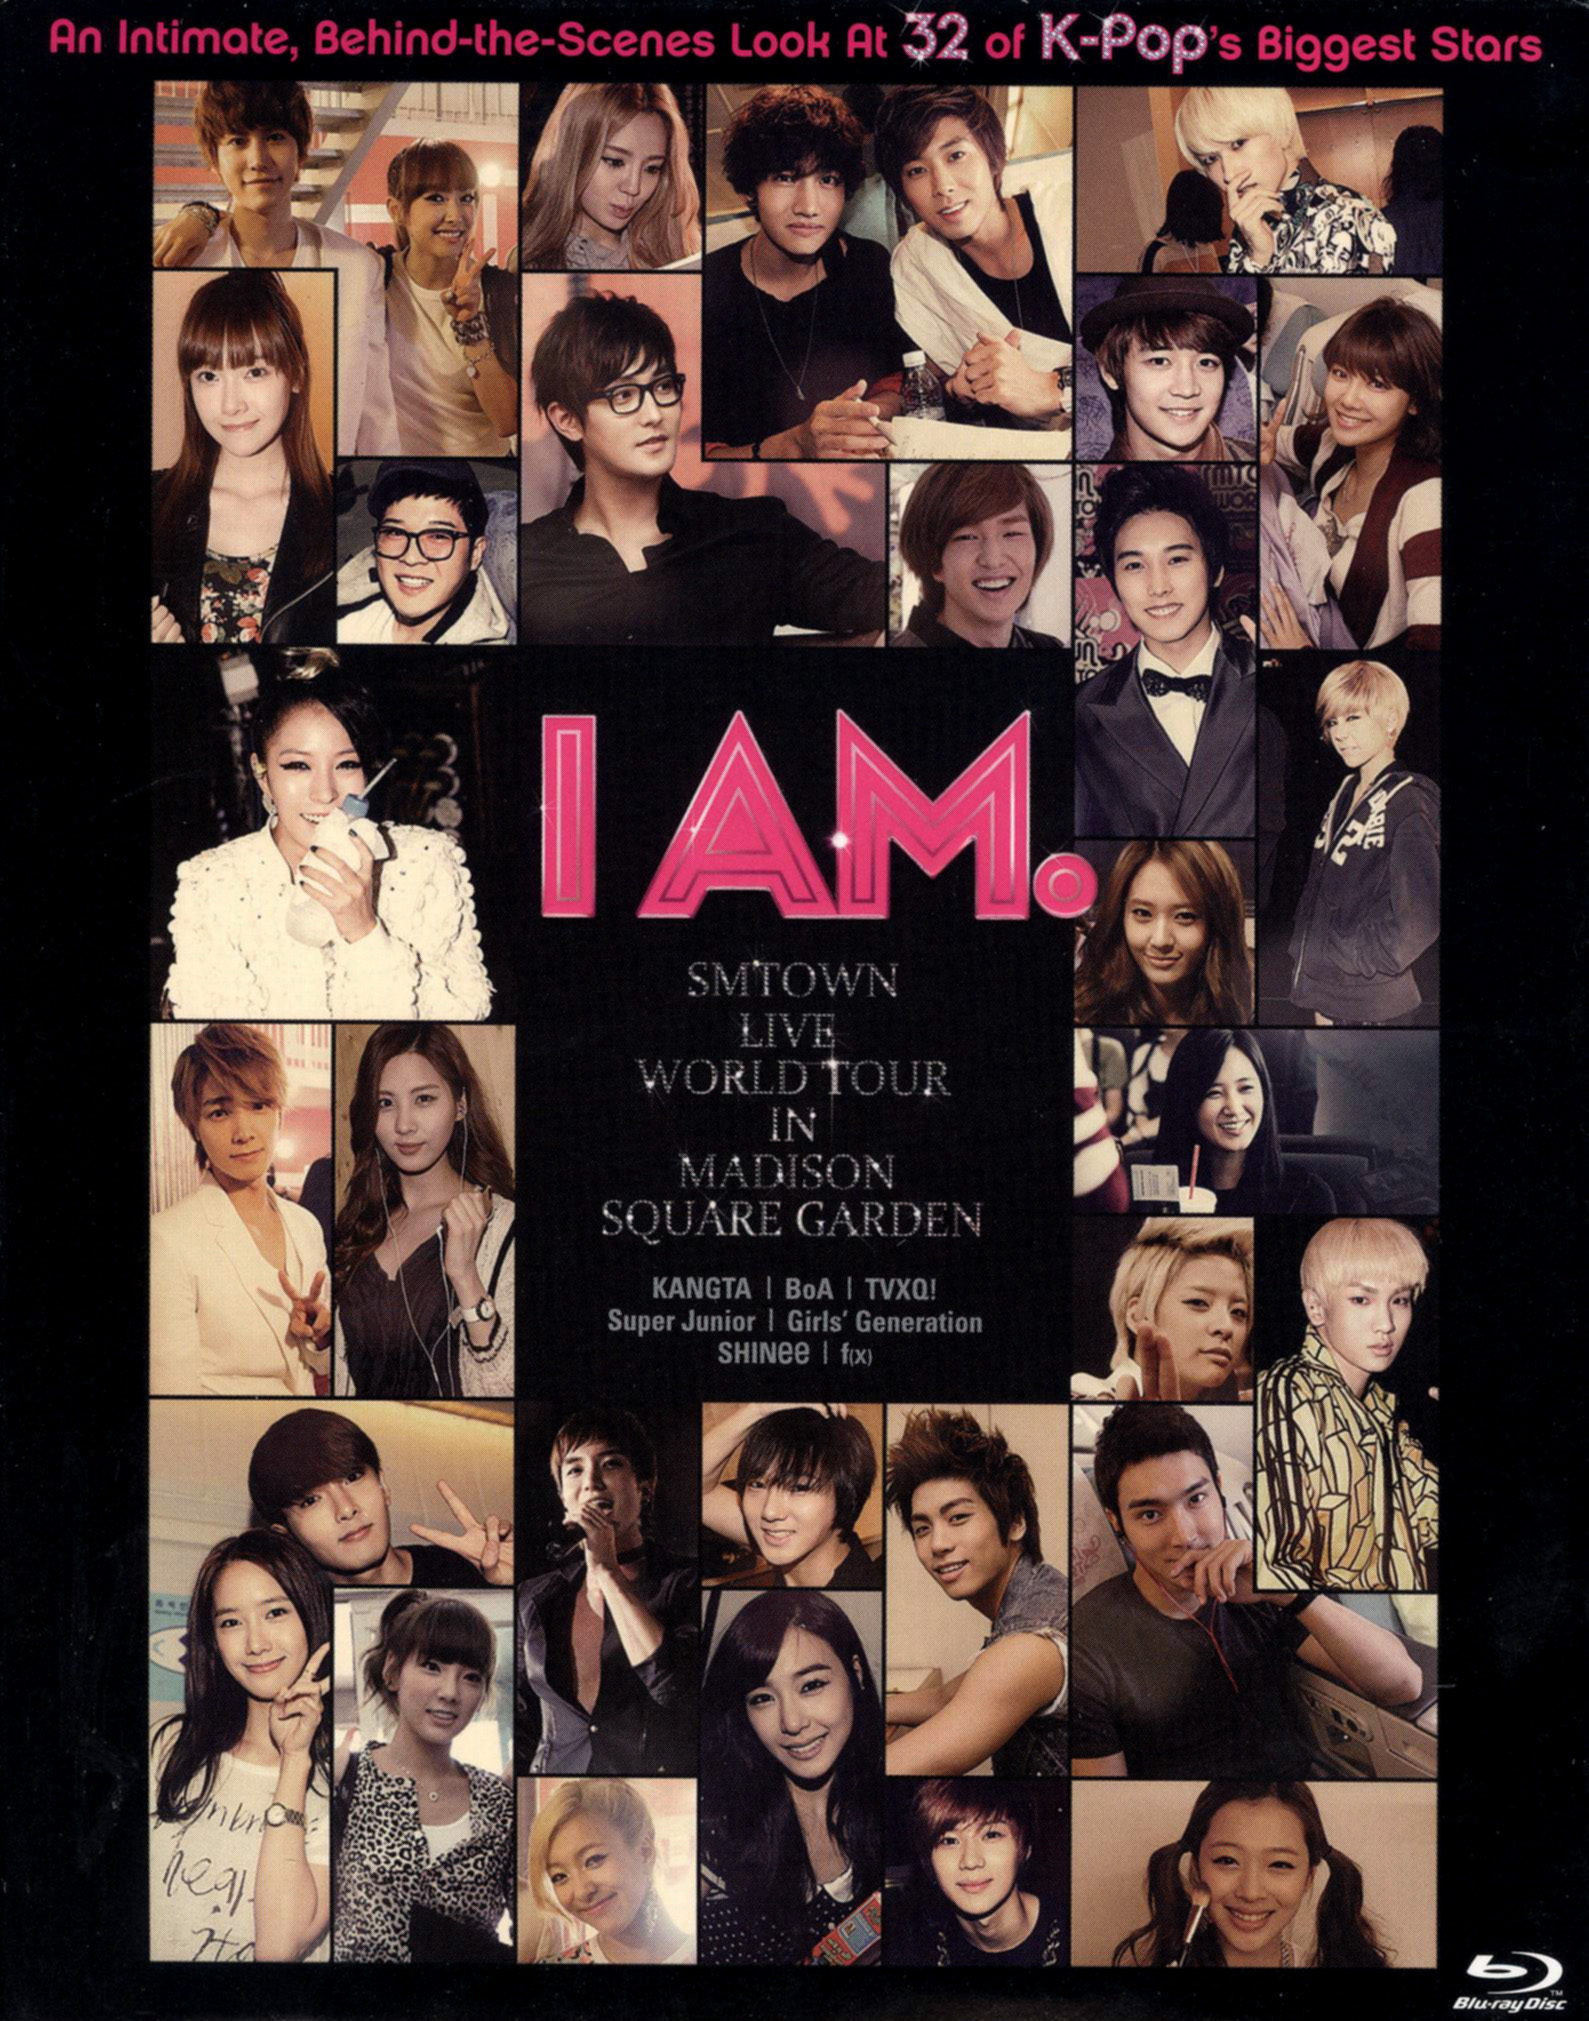 SMTOWN: I Am